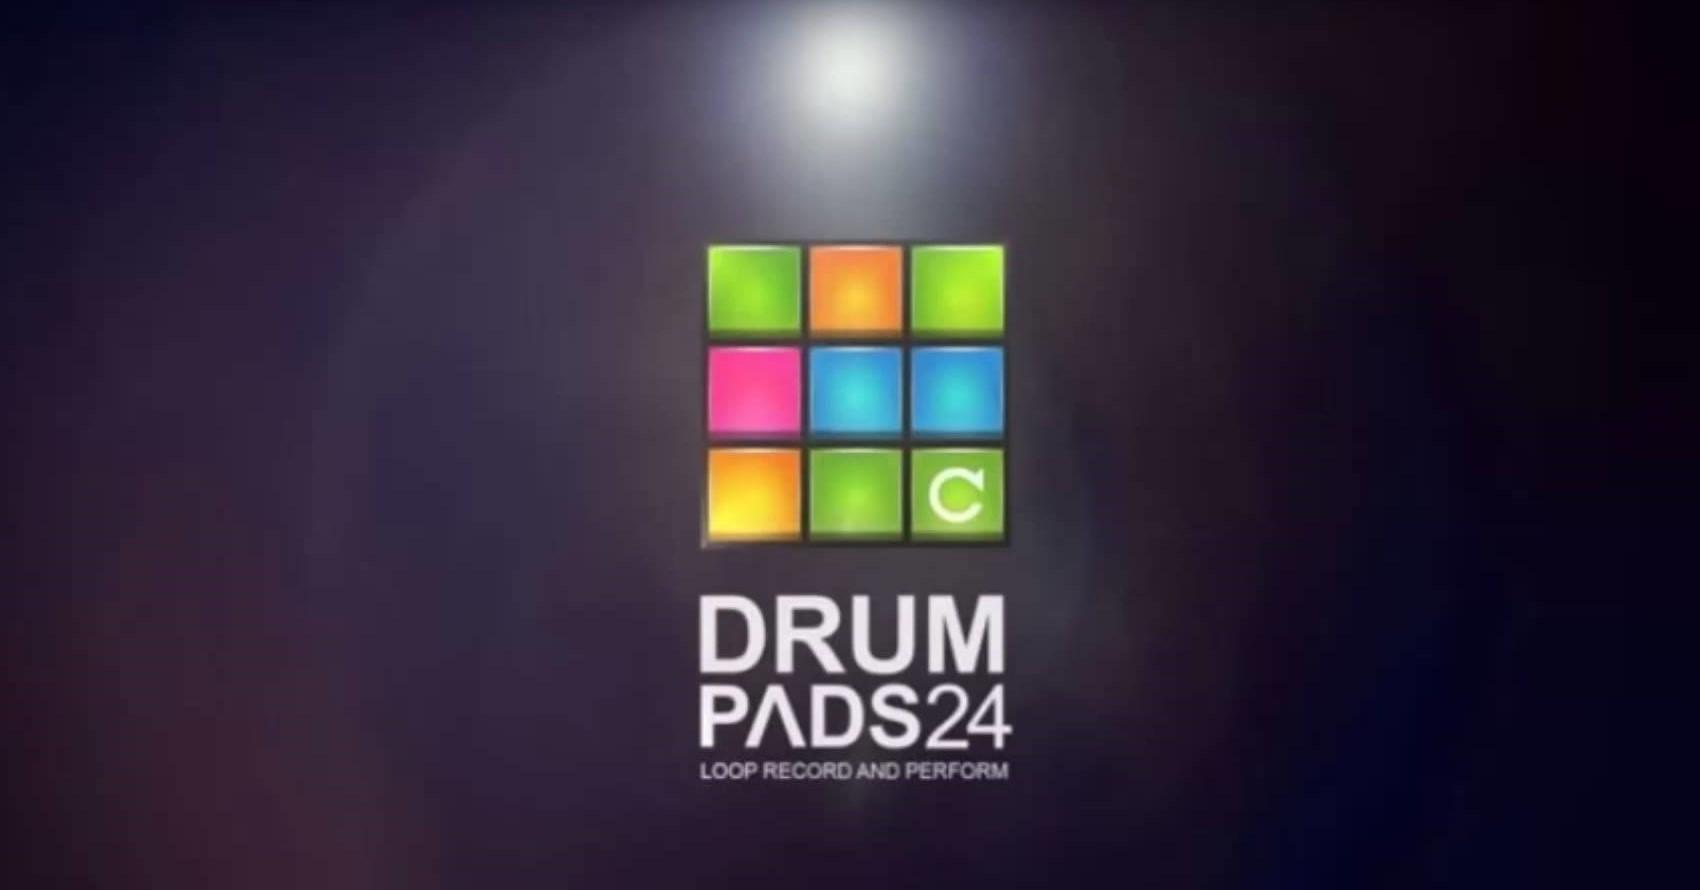 drum pads 24